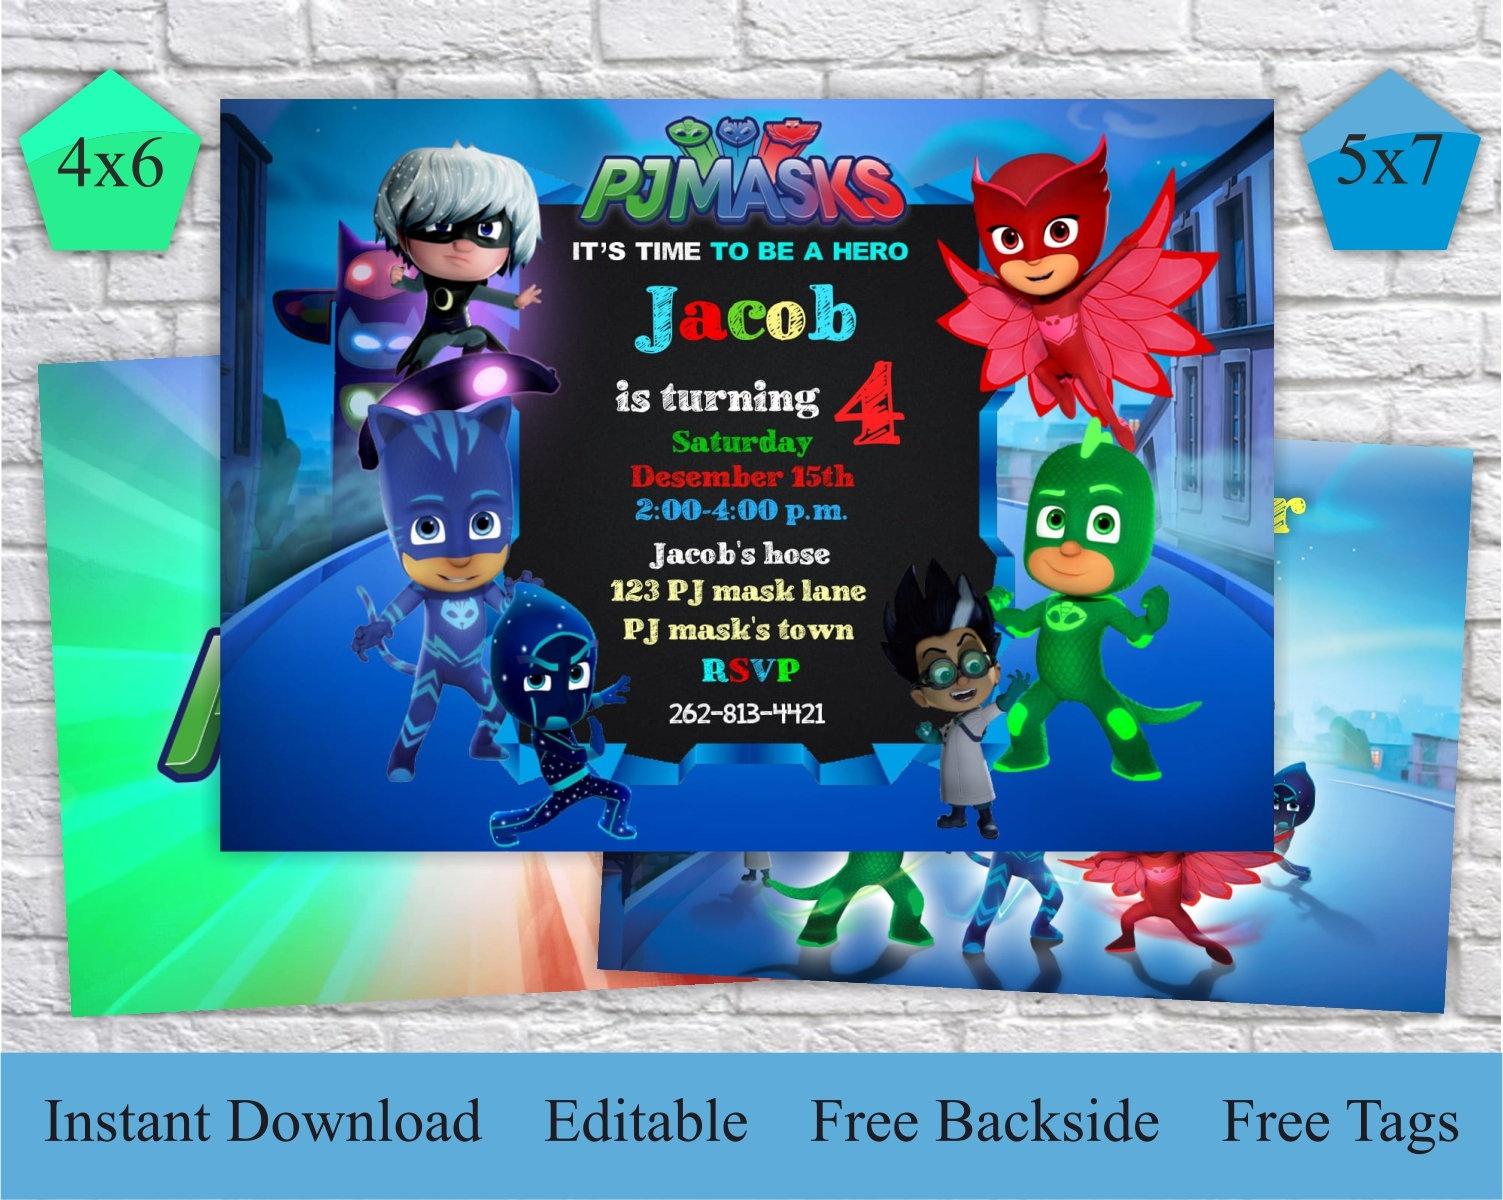 Pj Masks Invitation Free Thank You Card & Backside Pj Masks | Etsy - Free Printable Pj Masks Invitations